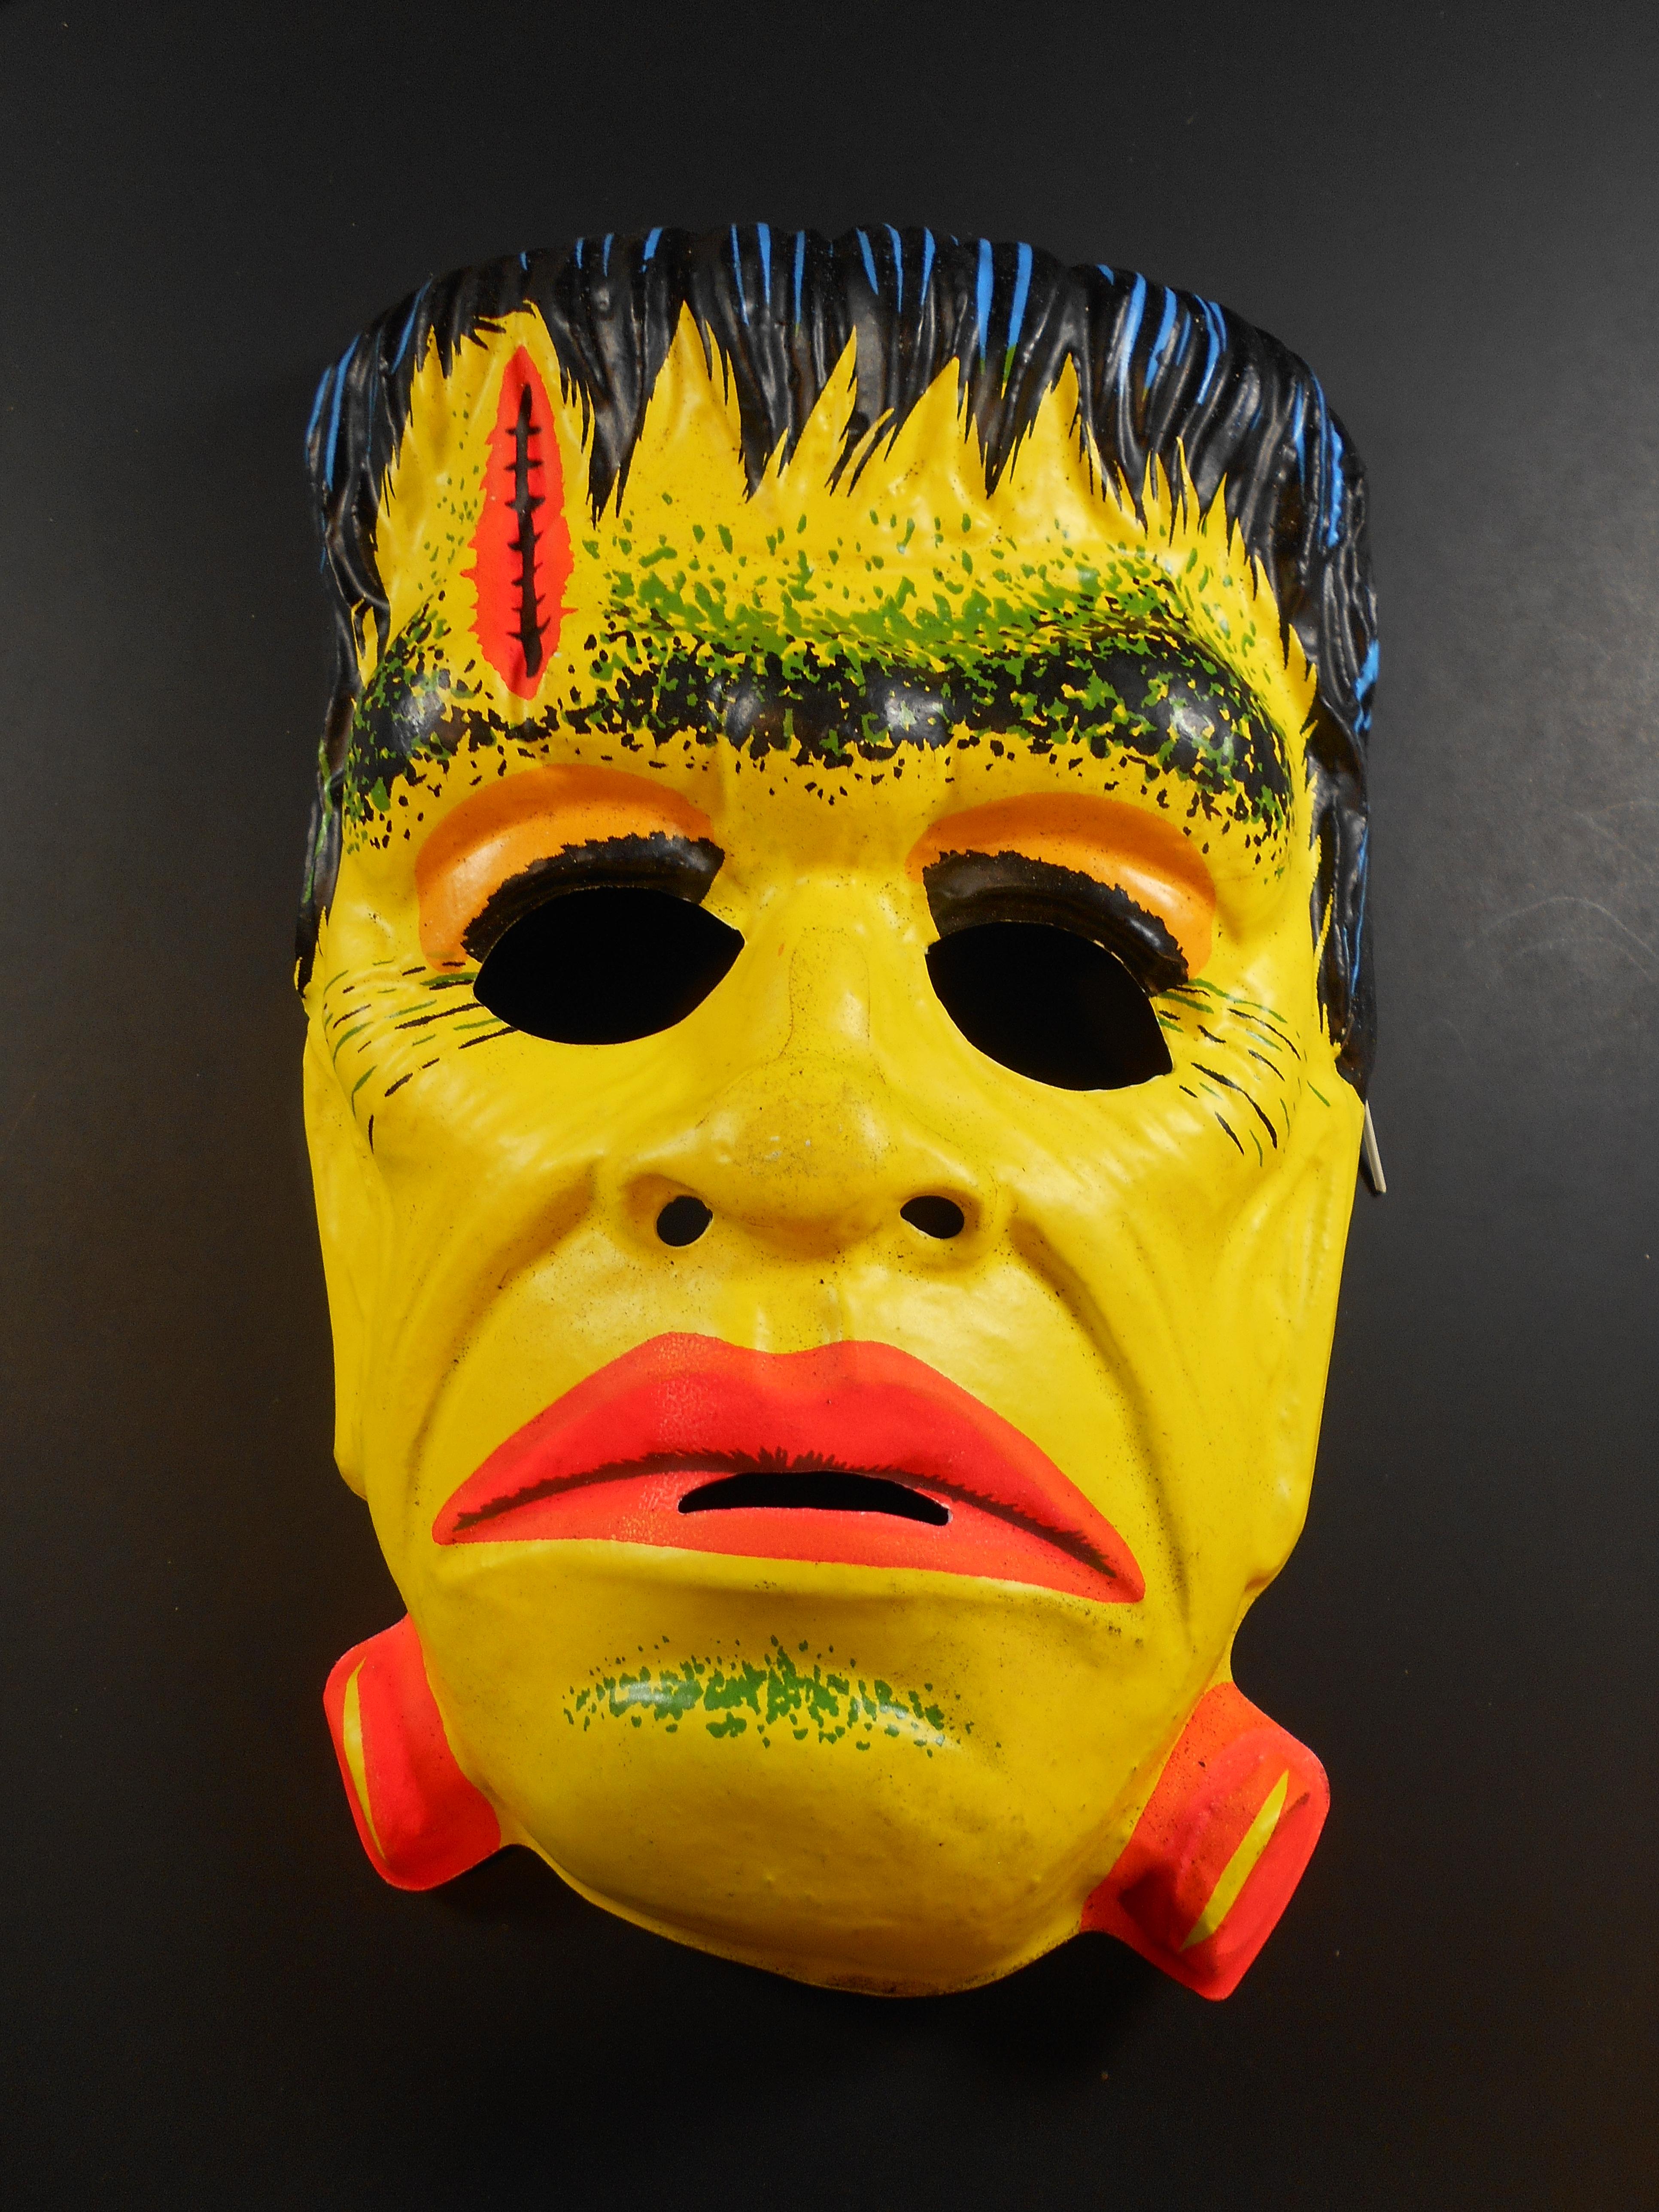 Ben Cooper Halloween Masks.Interview Ben Cooper Costumes Relaunched By Original Family Part 1 Halloween Daily News